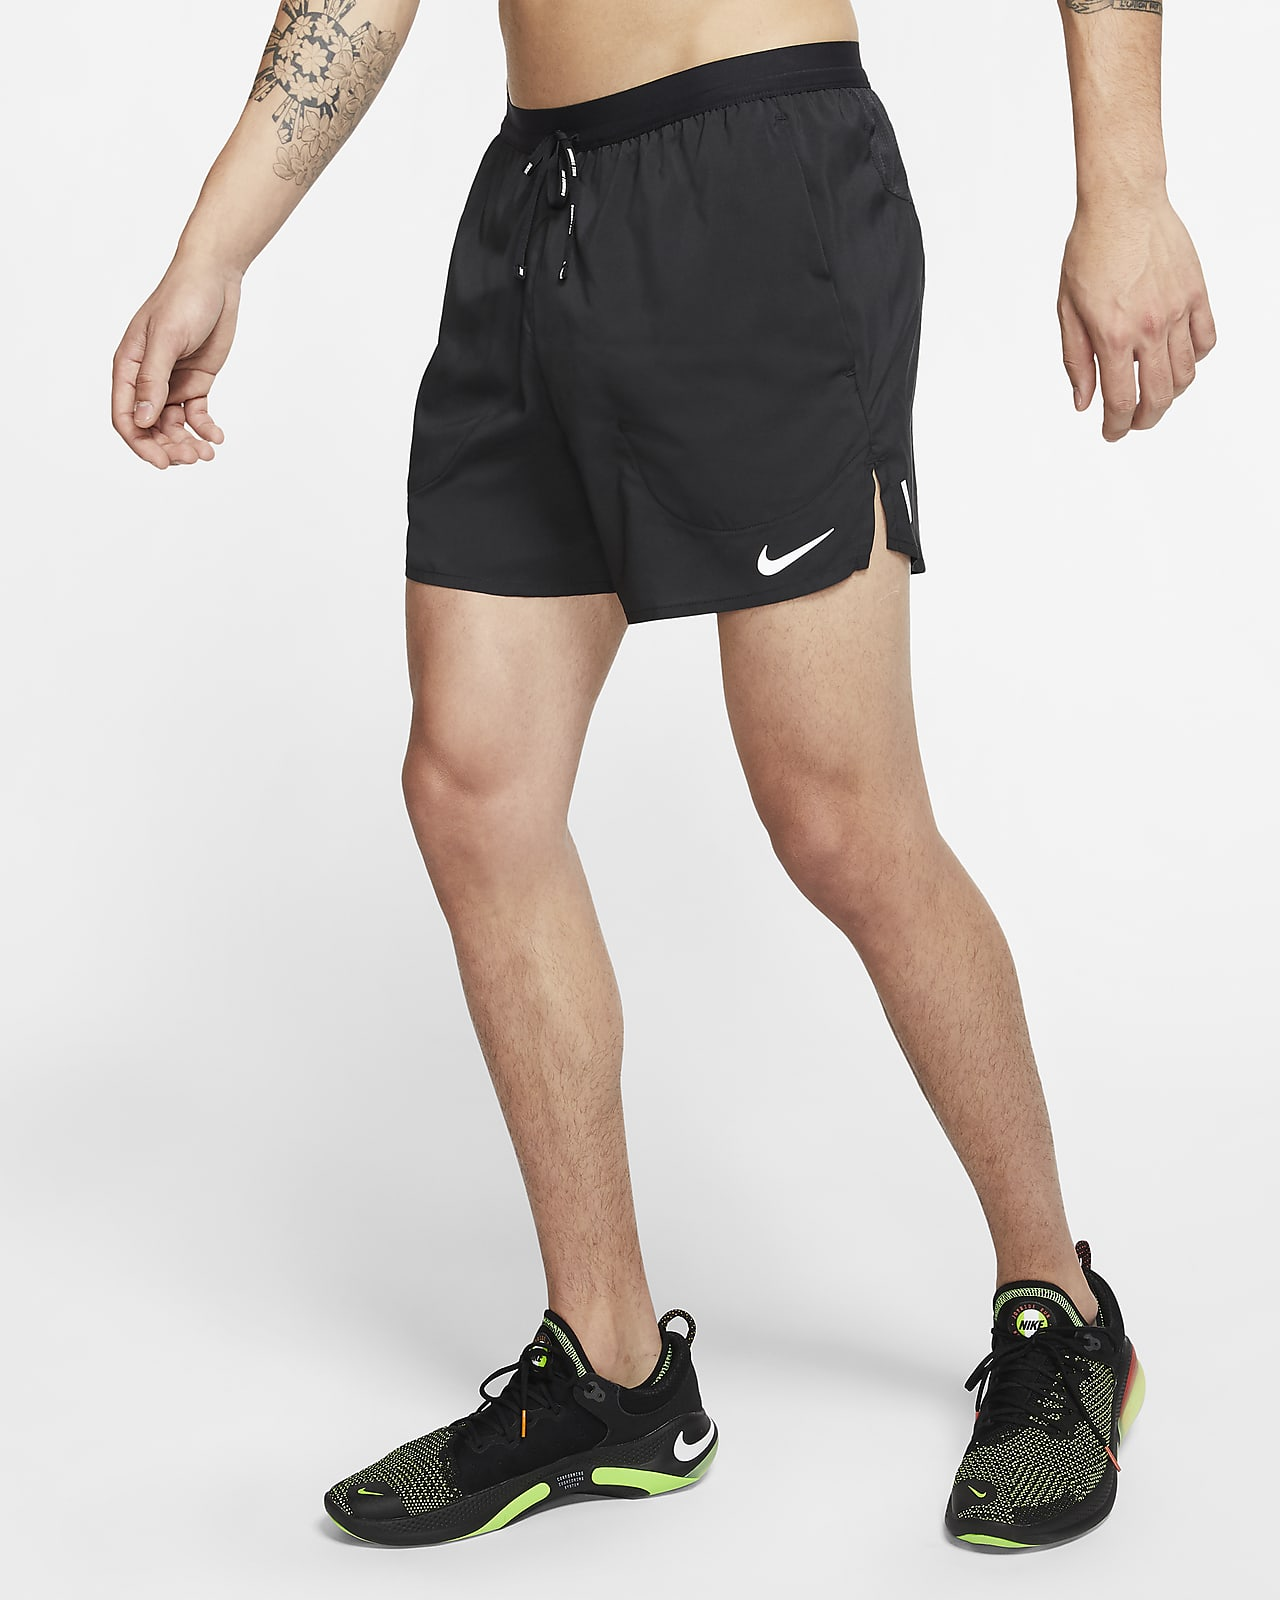 Nike Flex Stride Men's 13cm (approx